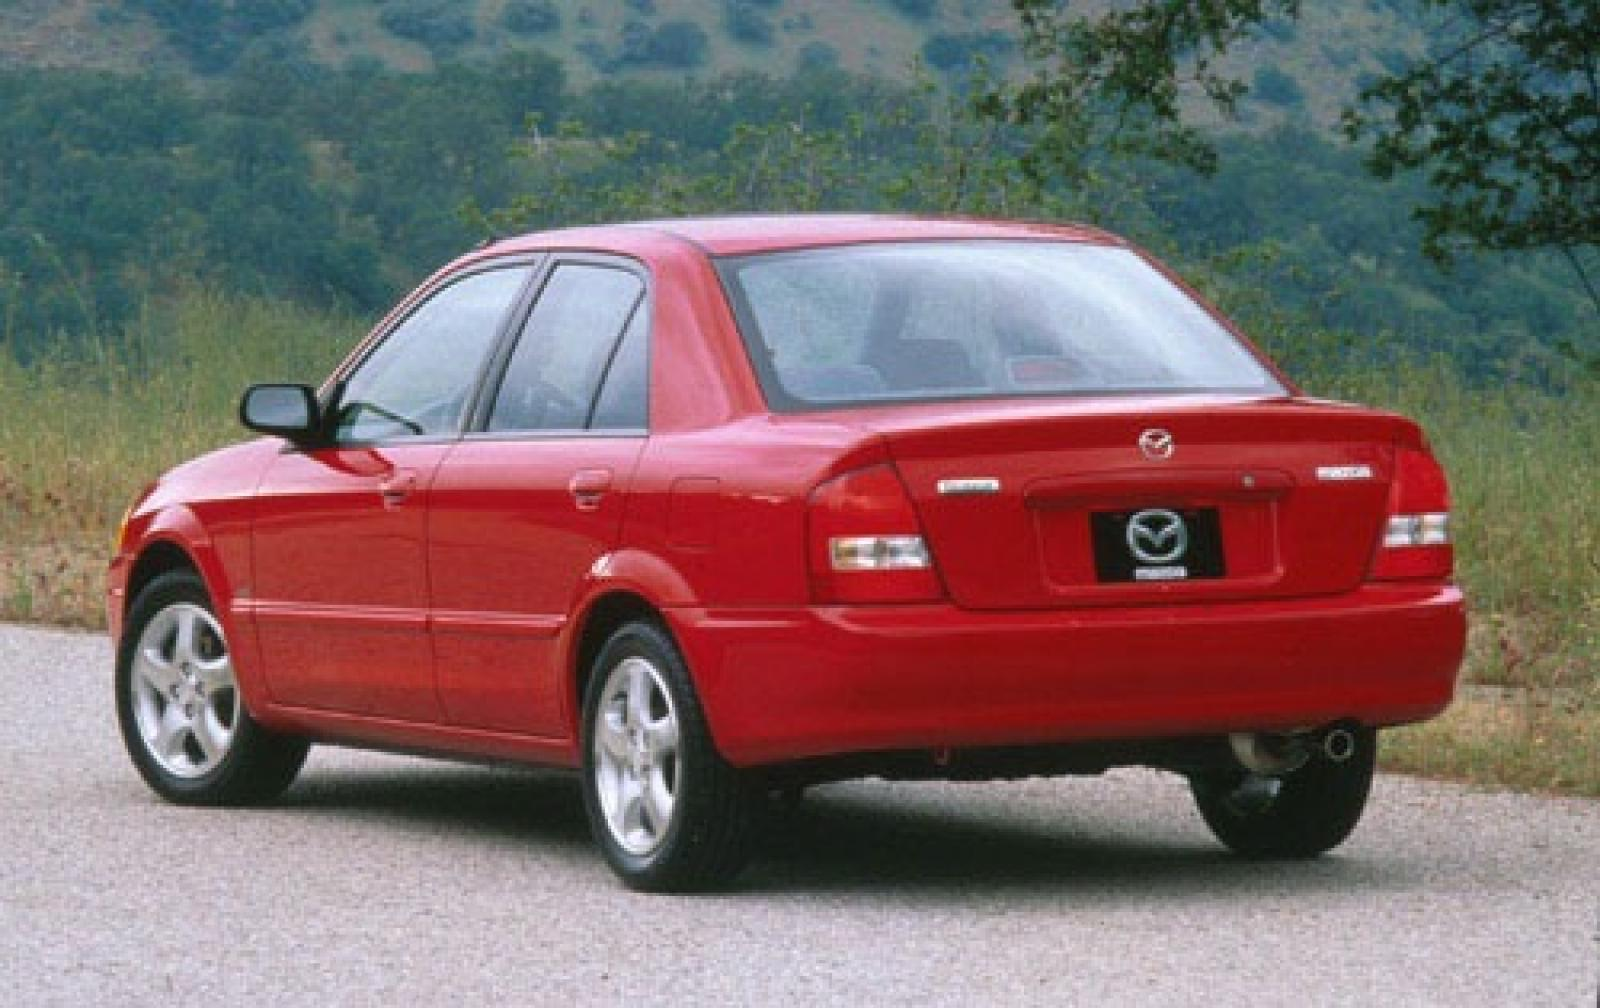 2002 Mazda Protege5 Fuse Box Wiring Diagram Landor Engine For Protege 5 6 2001 Interior